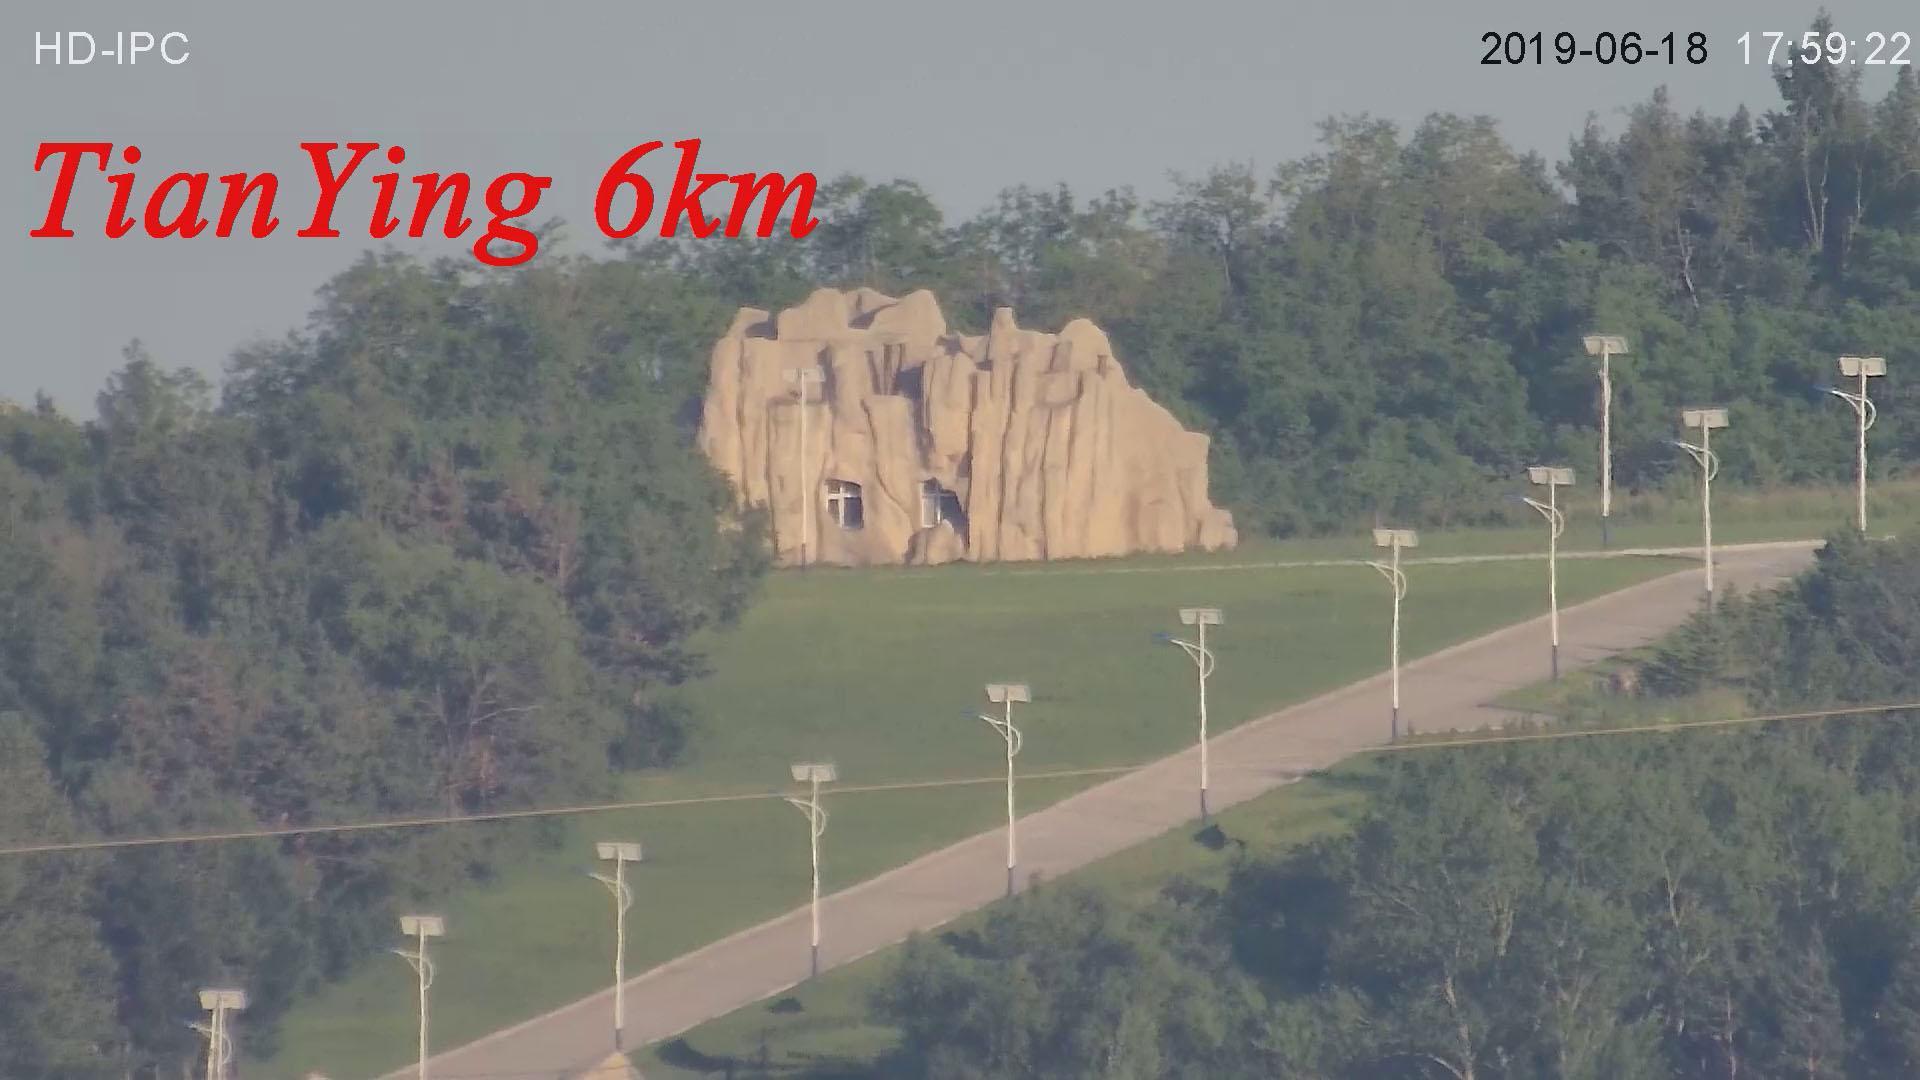 20km Tank TV Thermal Camera Laser Rangefinder Auto Tracking Surveillance System 9